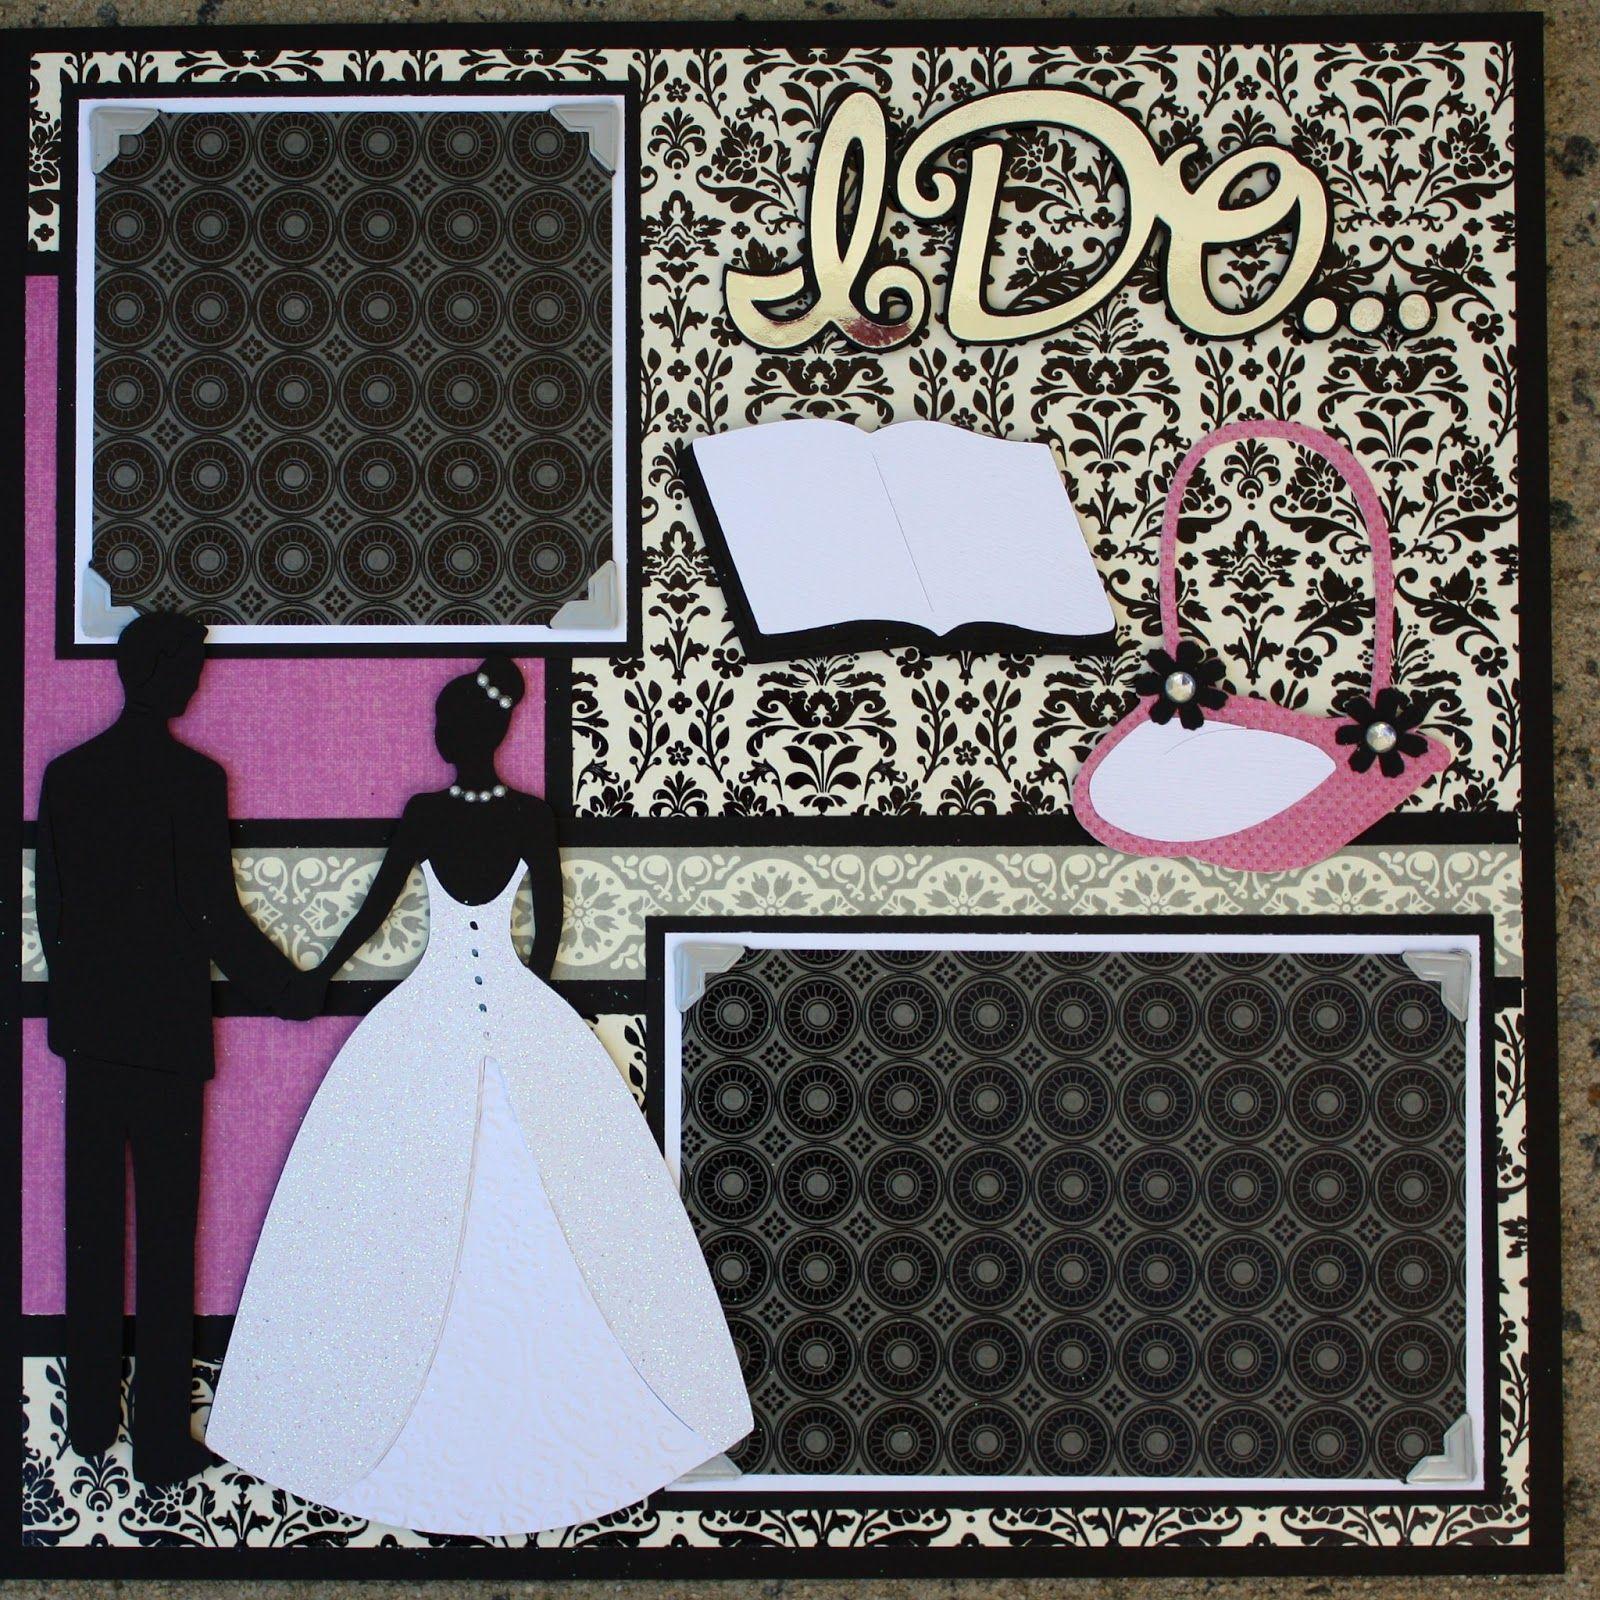 Wedding scrapbook ideas using cricut - Cricut Wedding Layouts Wedding Album Series Tie The Knot 12x12 Double Scrapbook Layout